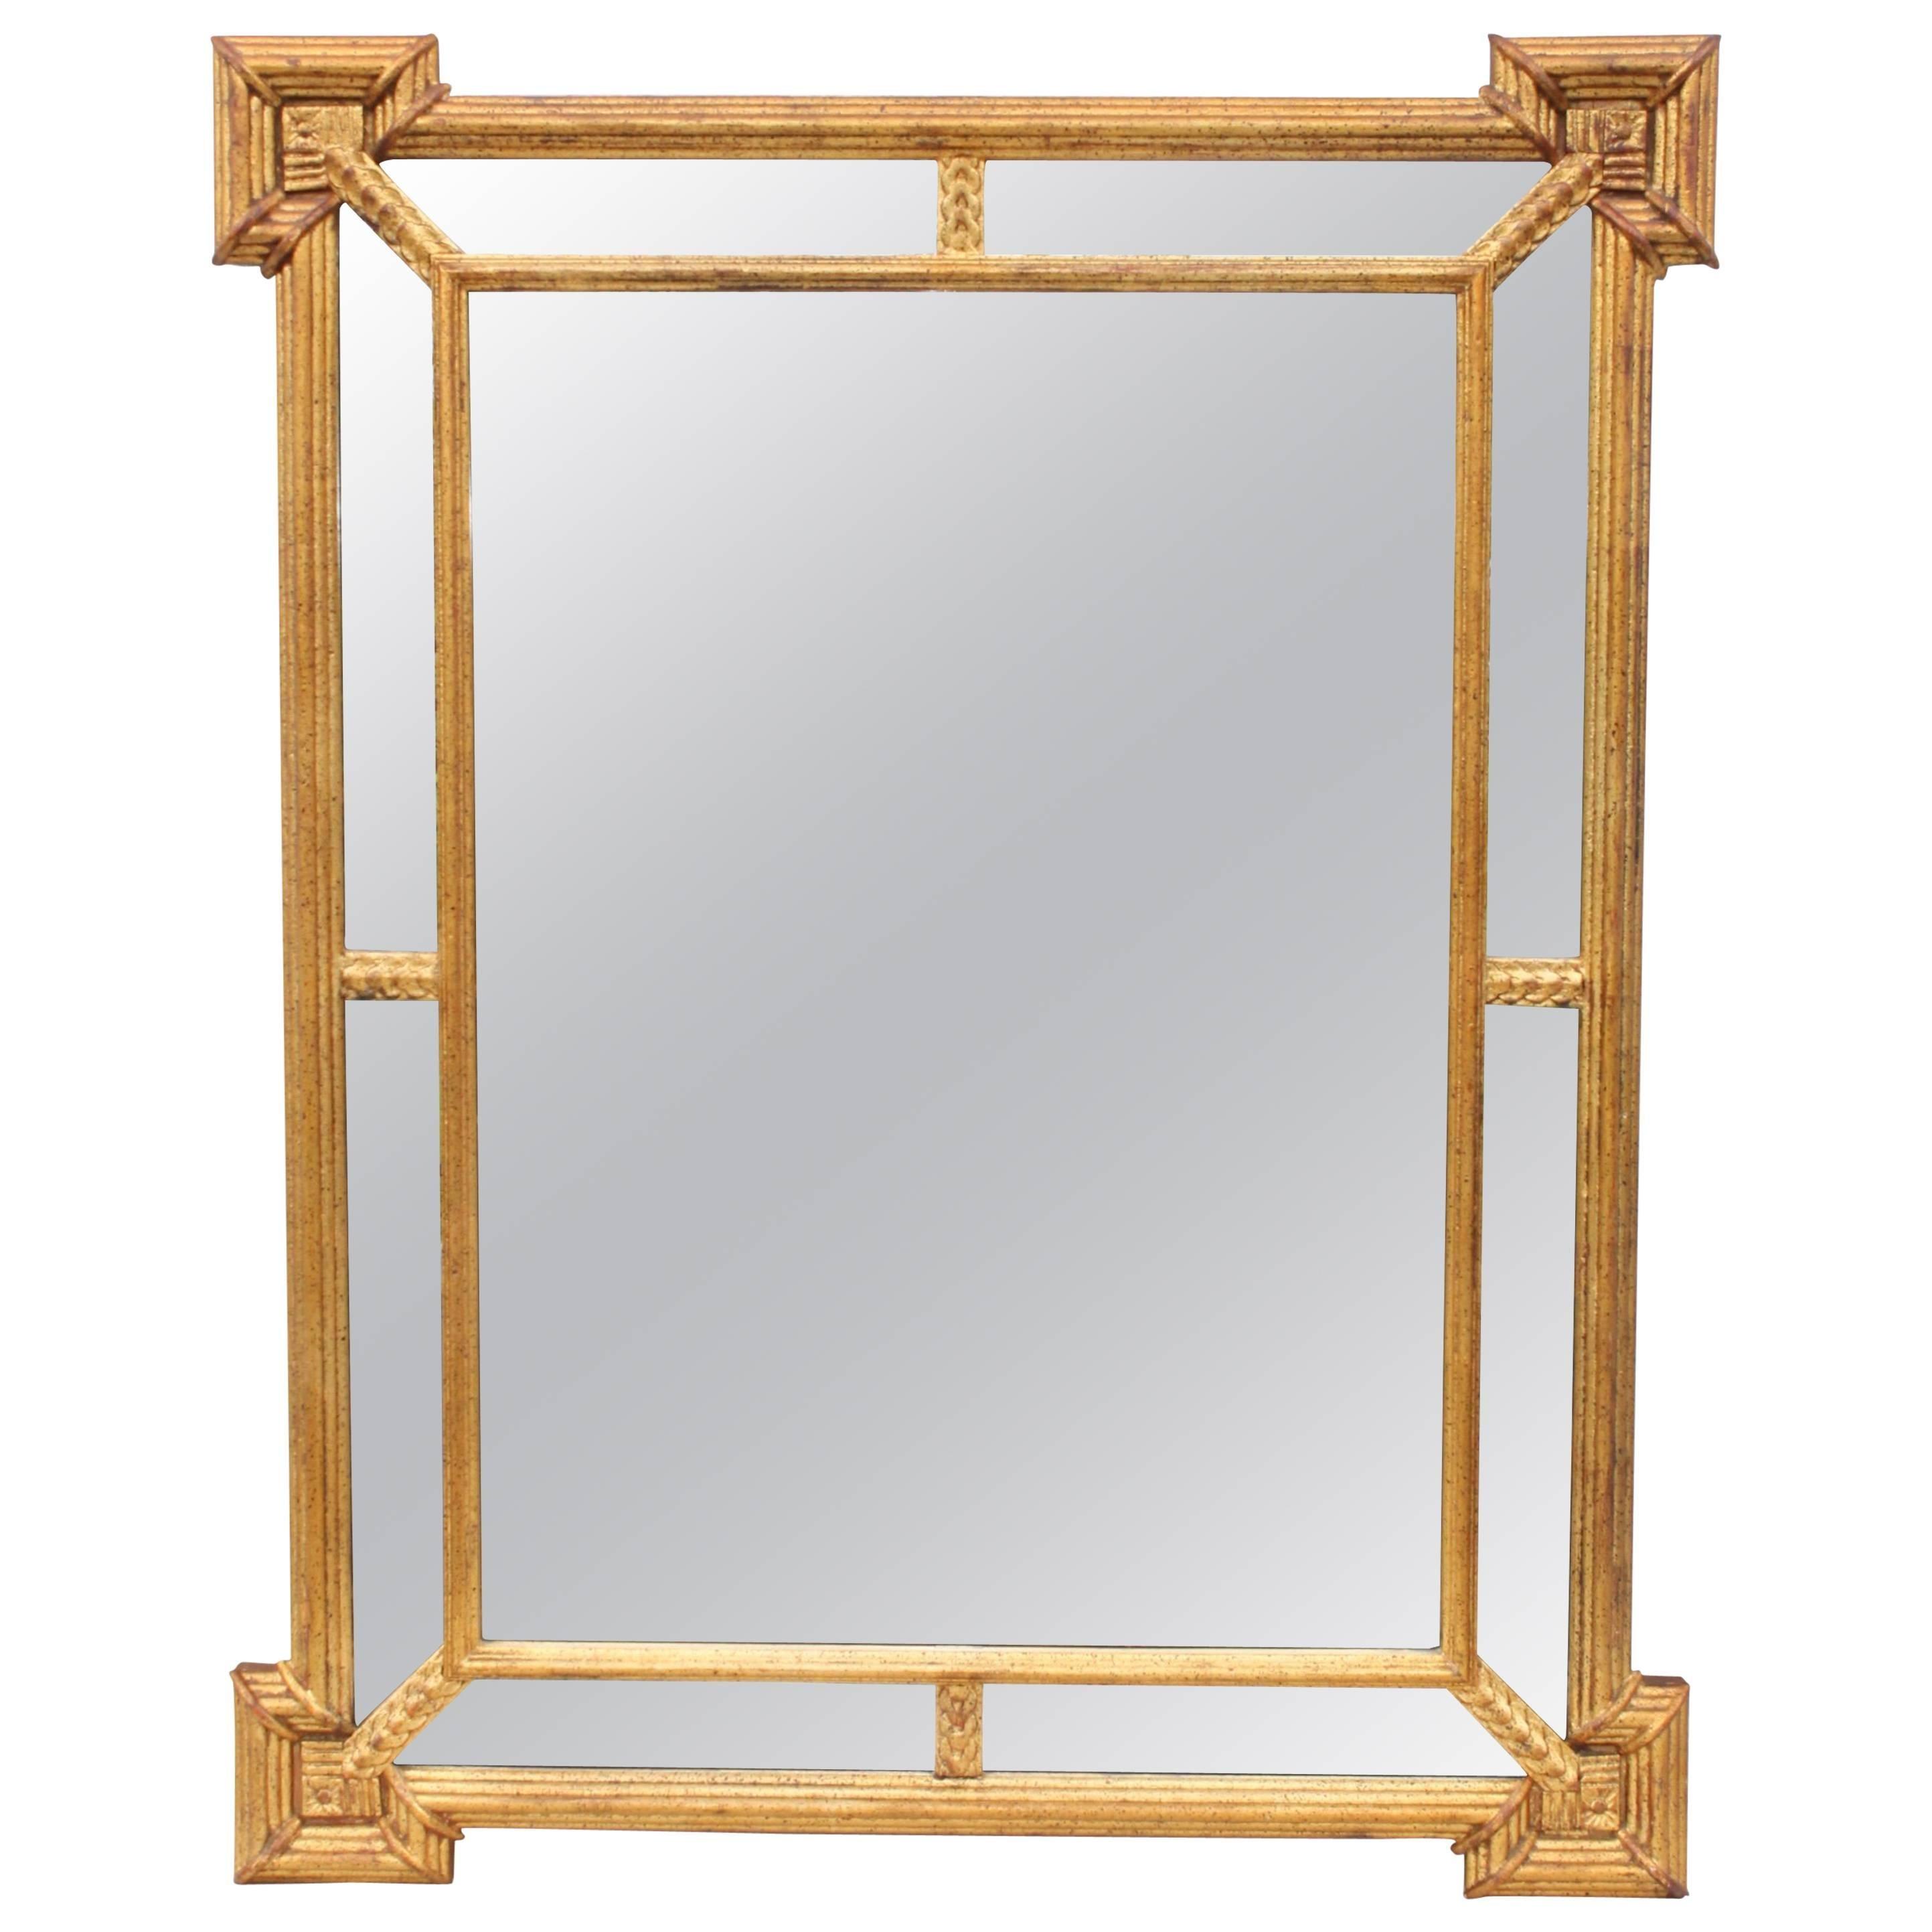 1950s Italian Giltwood Mirror By La Barge